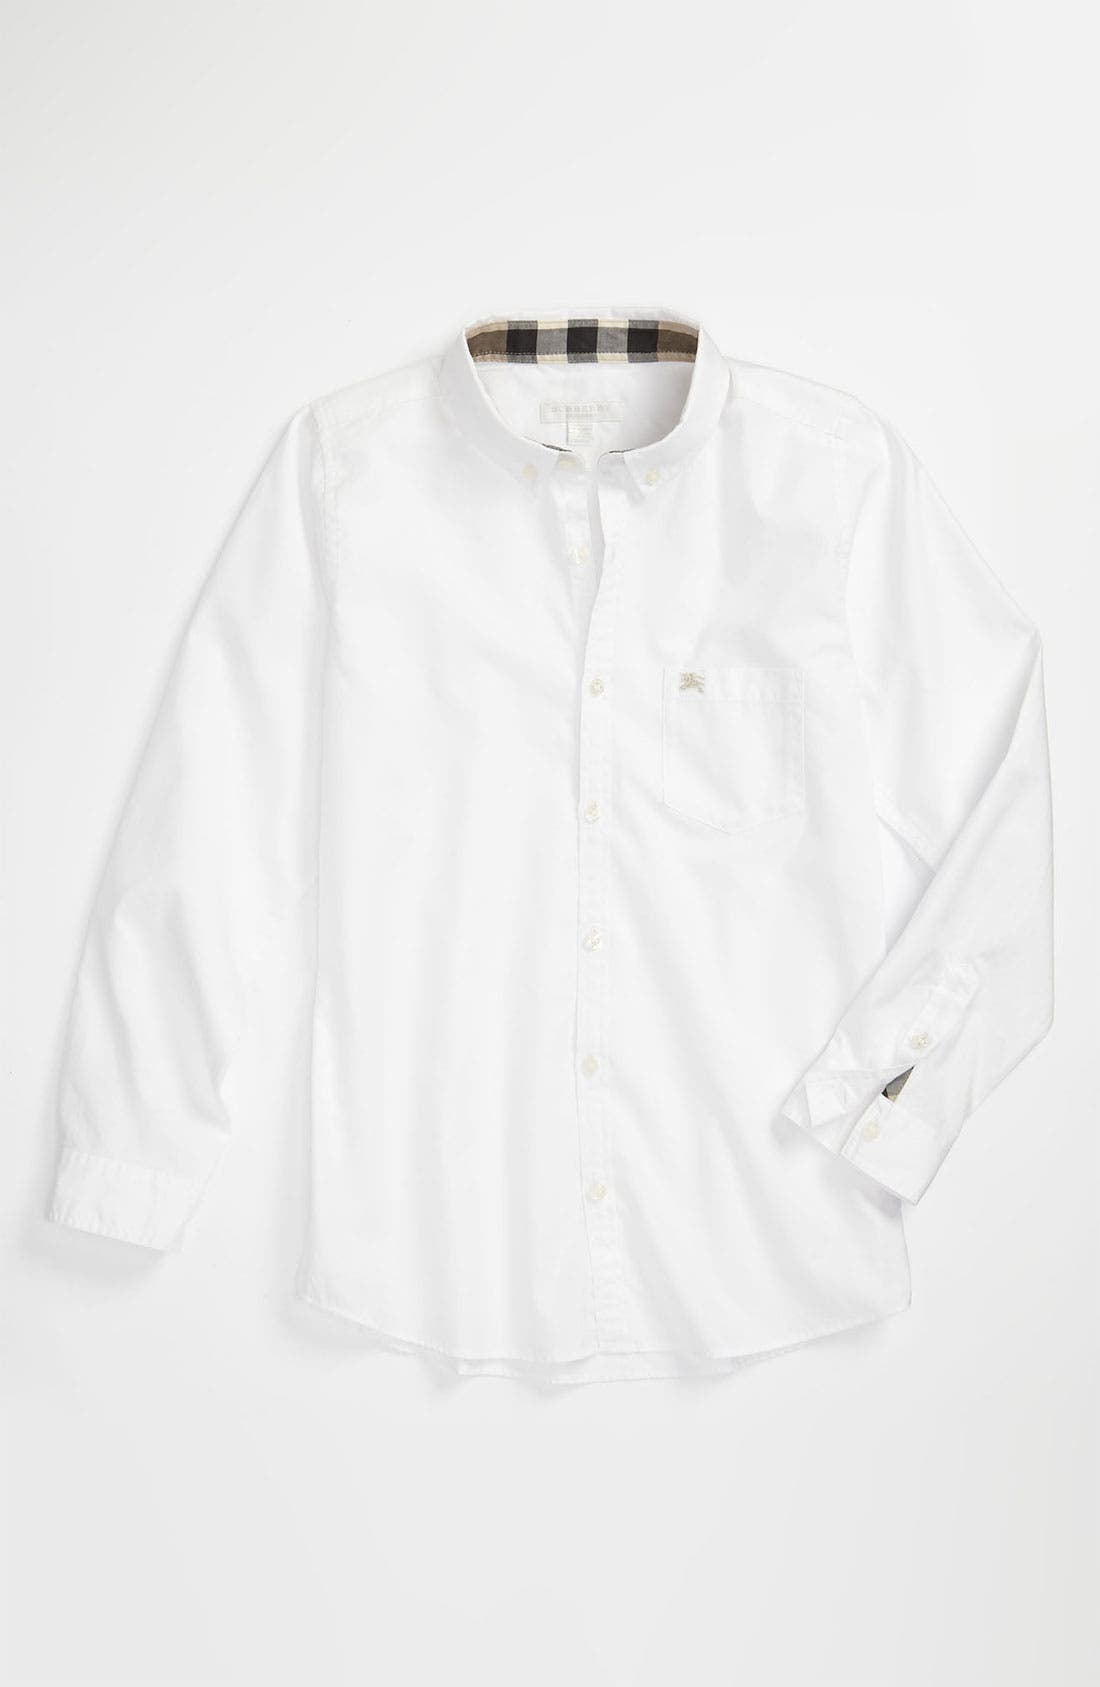 Alternate Image 1 Selected - Burberry Oxford Shirt (Big Boys)